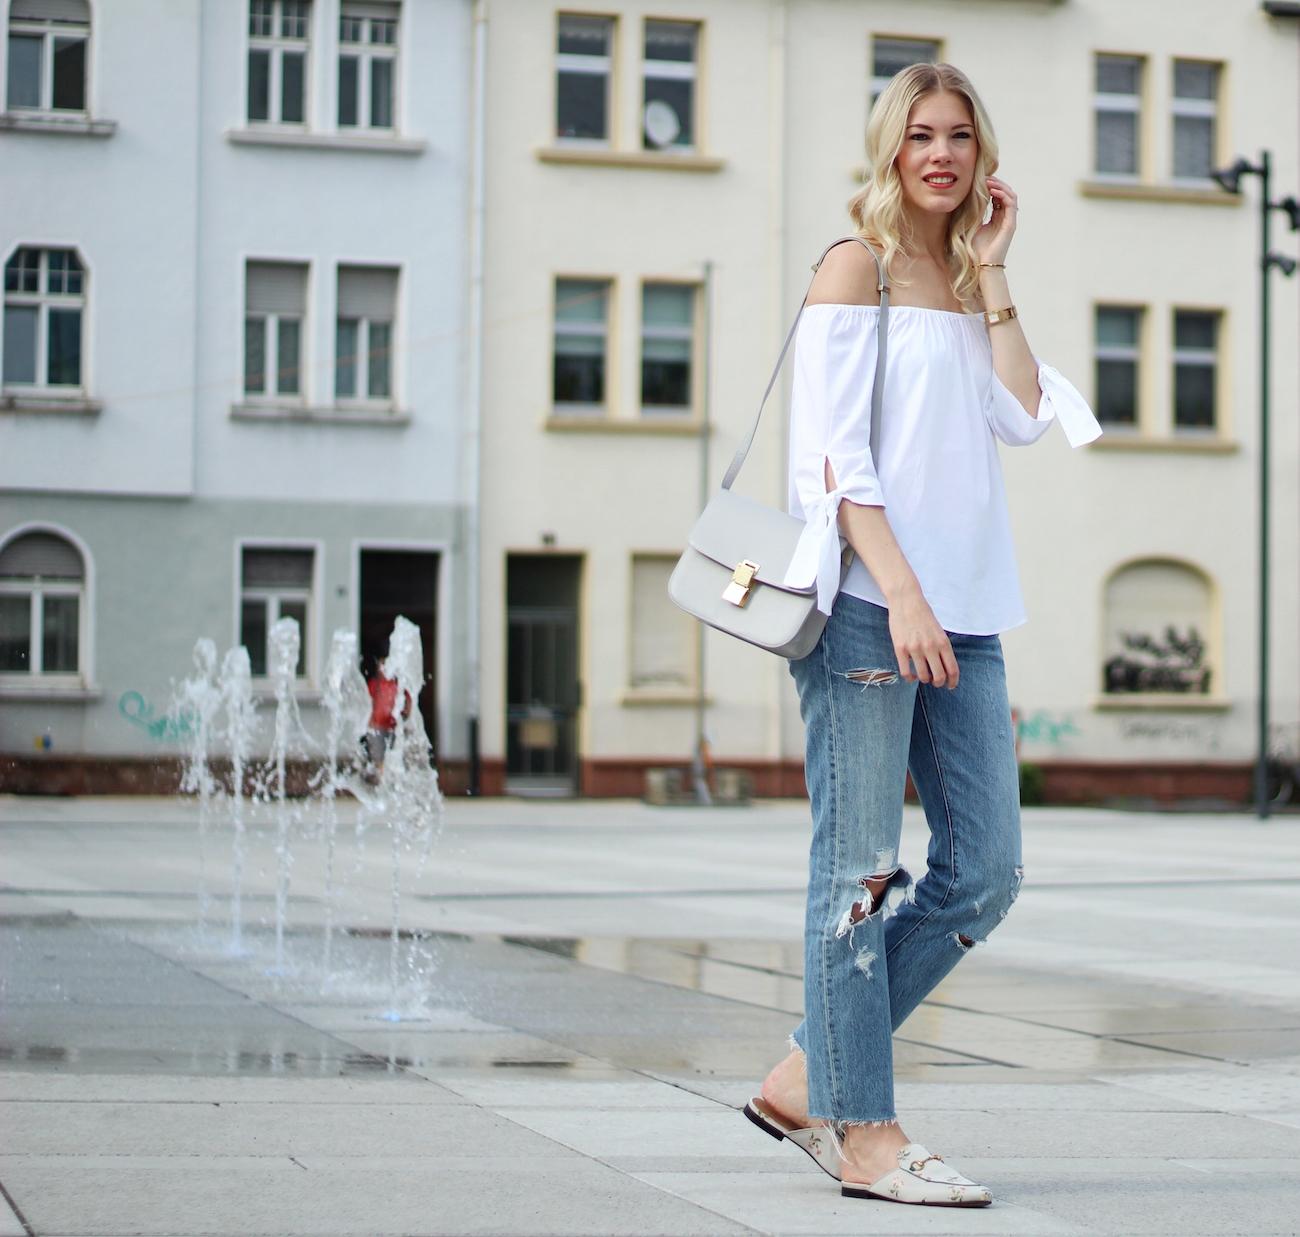 Zara-off-shoulder-top-gucci-slipper25